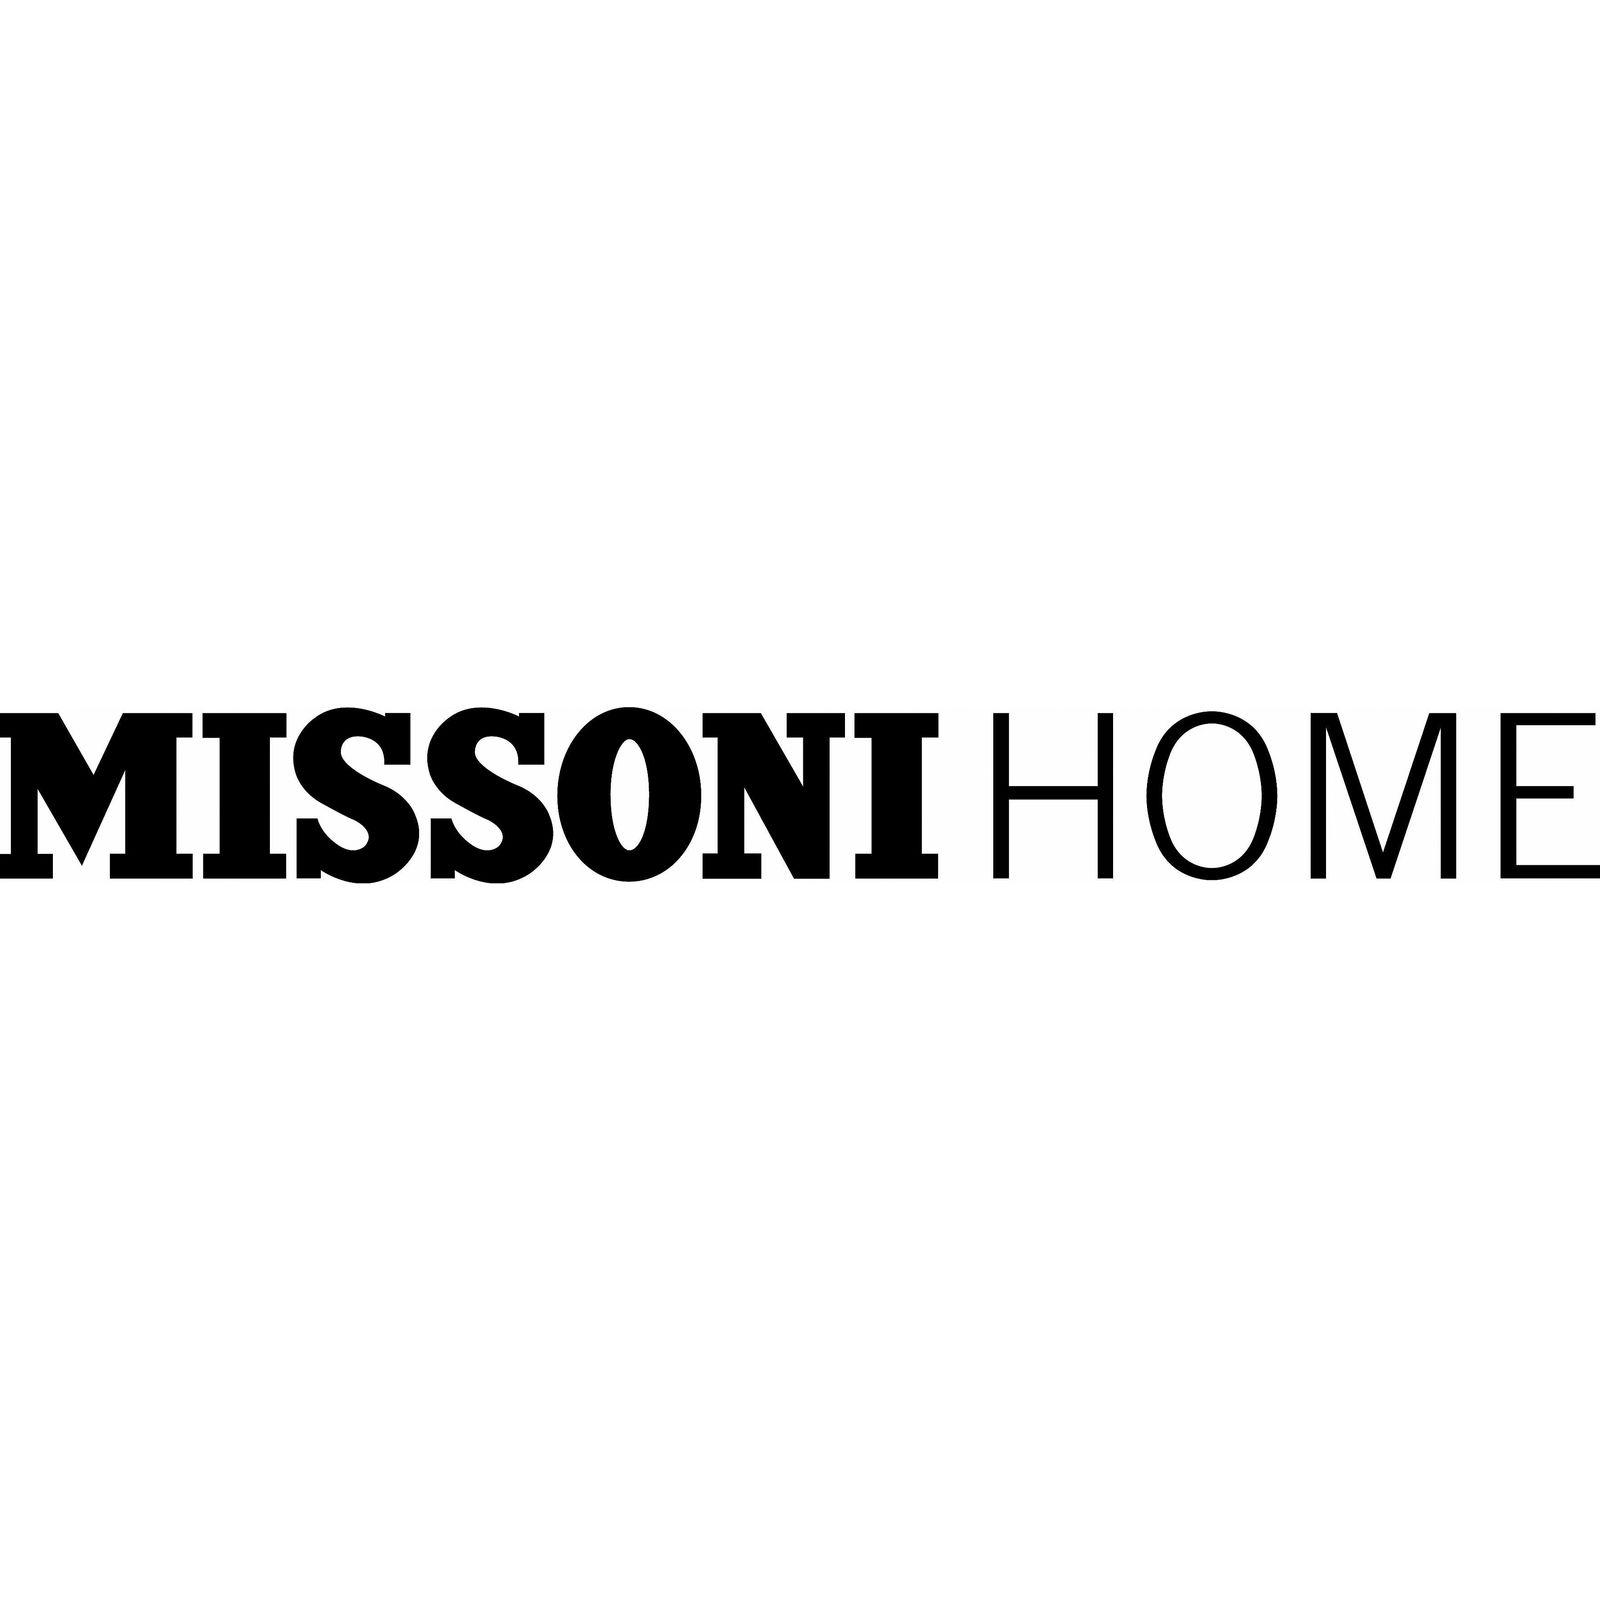 MISSONI HOME (Image 1)